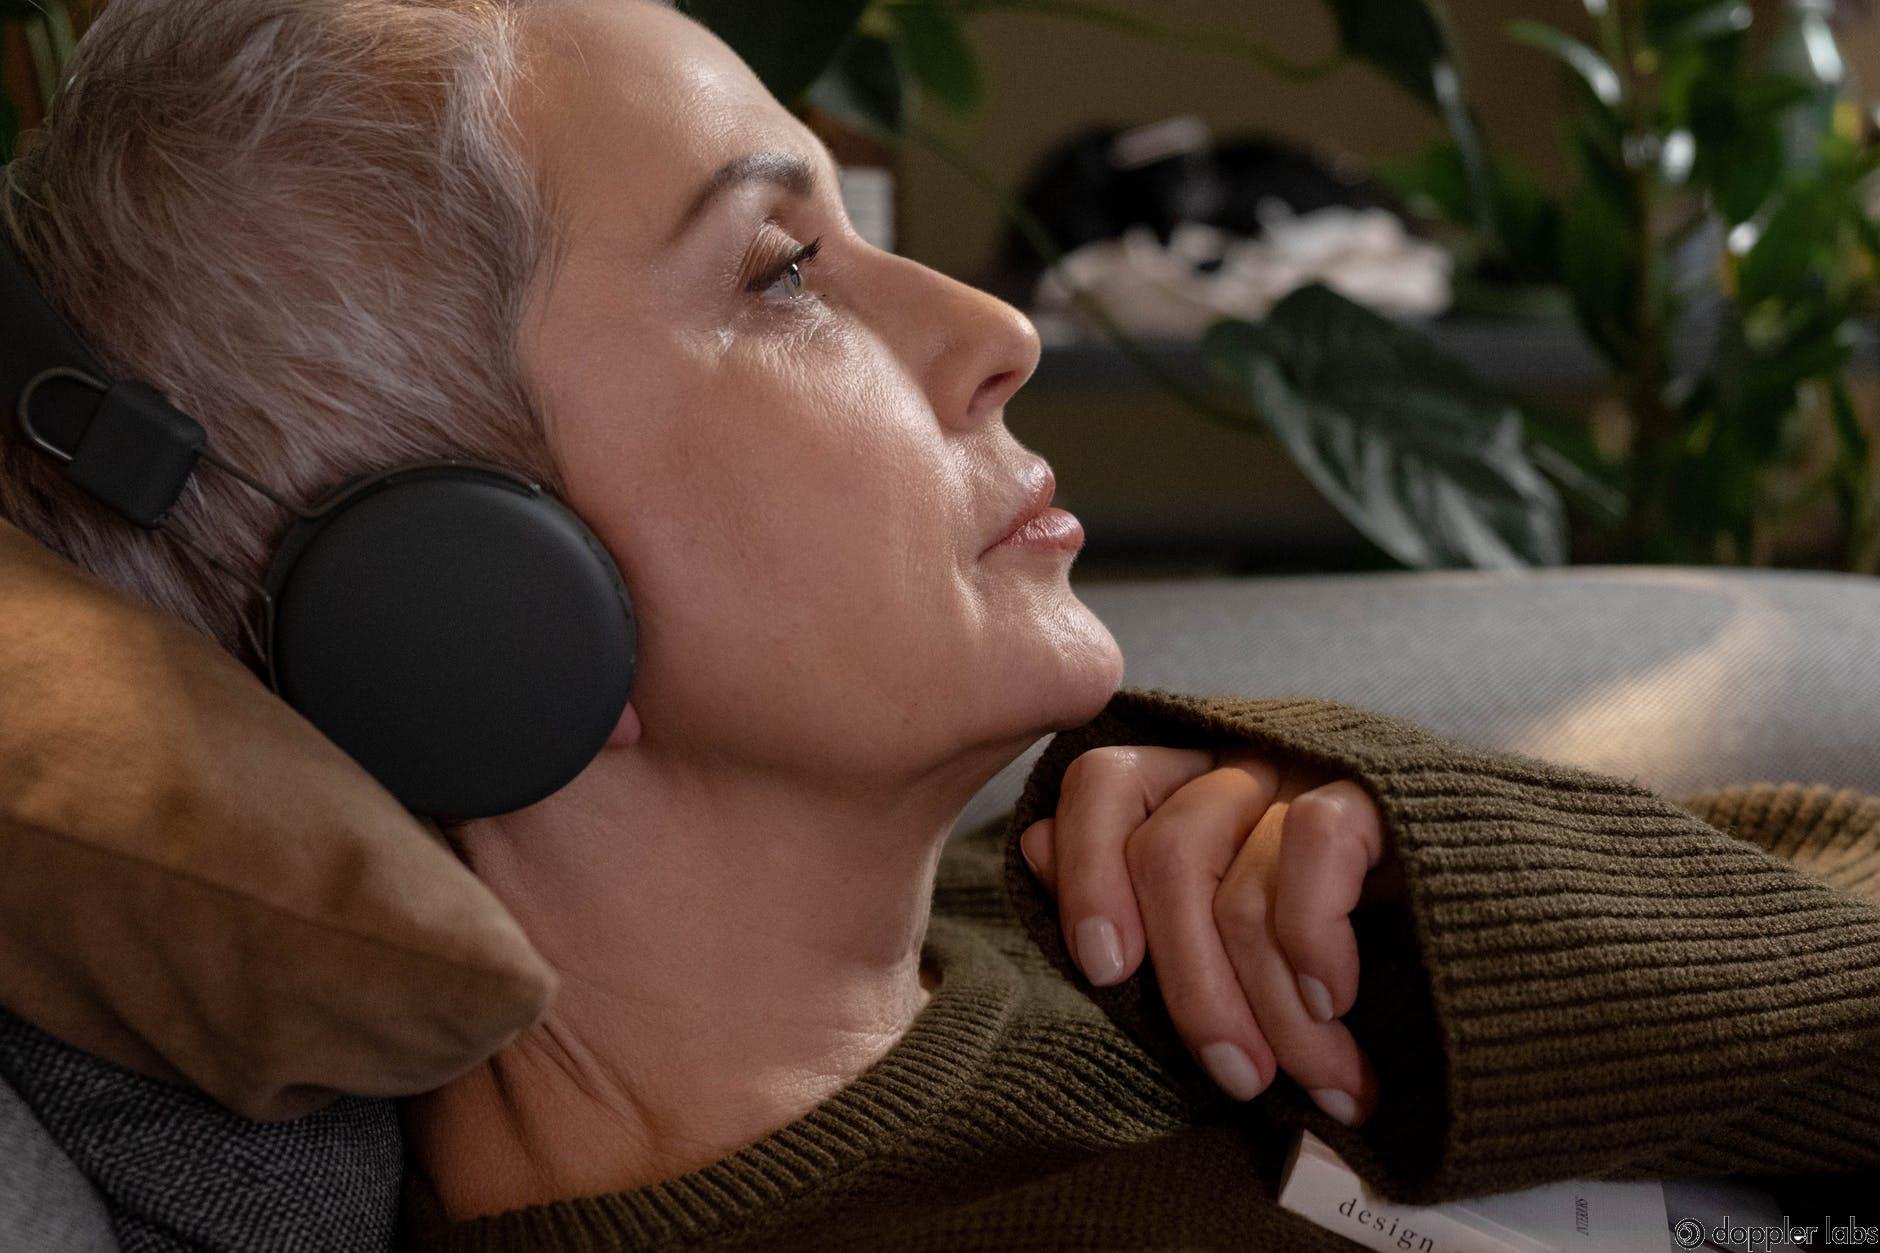 Simple Average Setting For Headphone While Sleeping